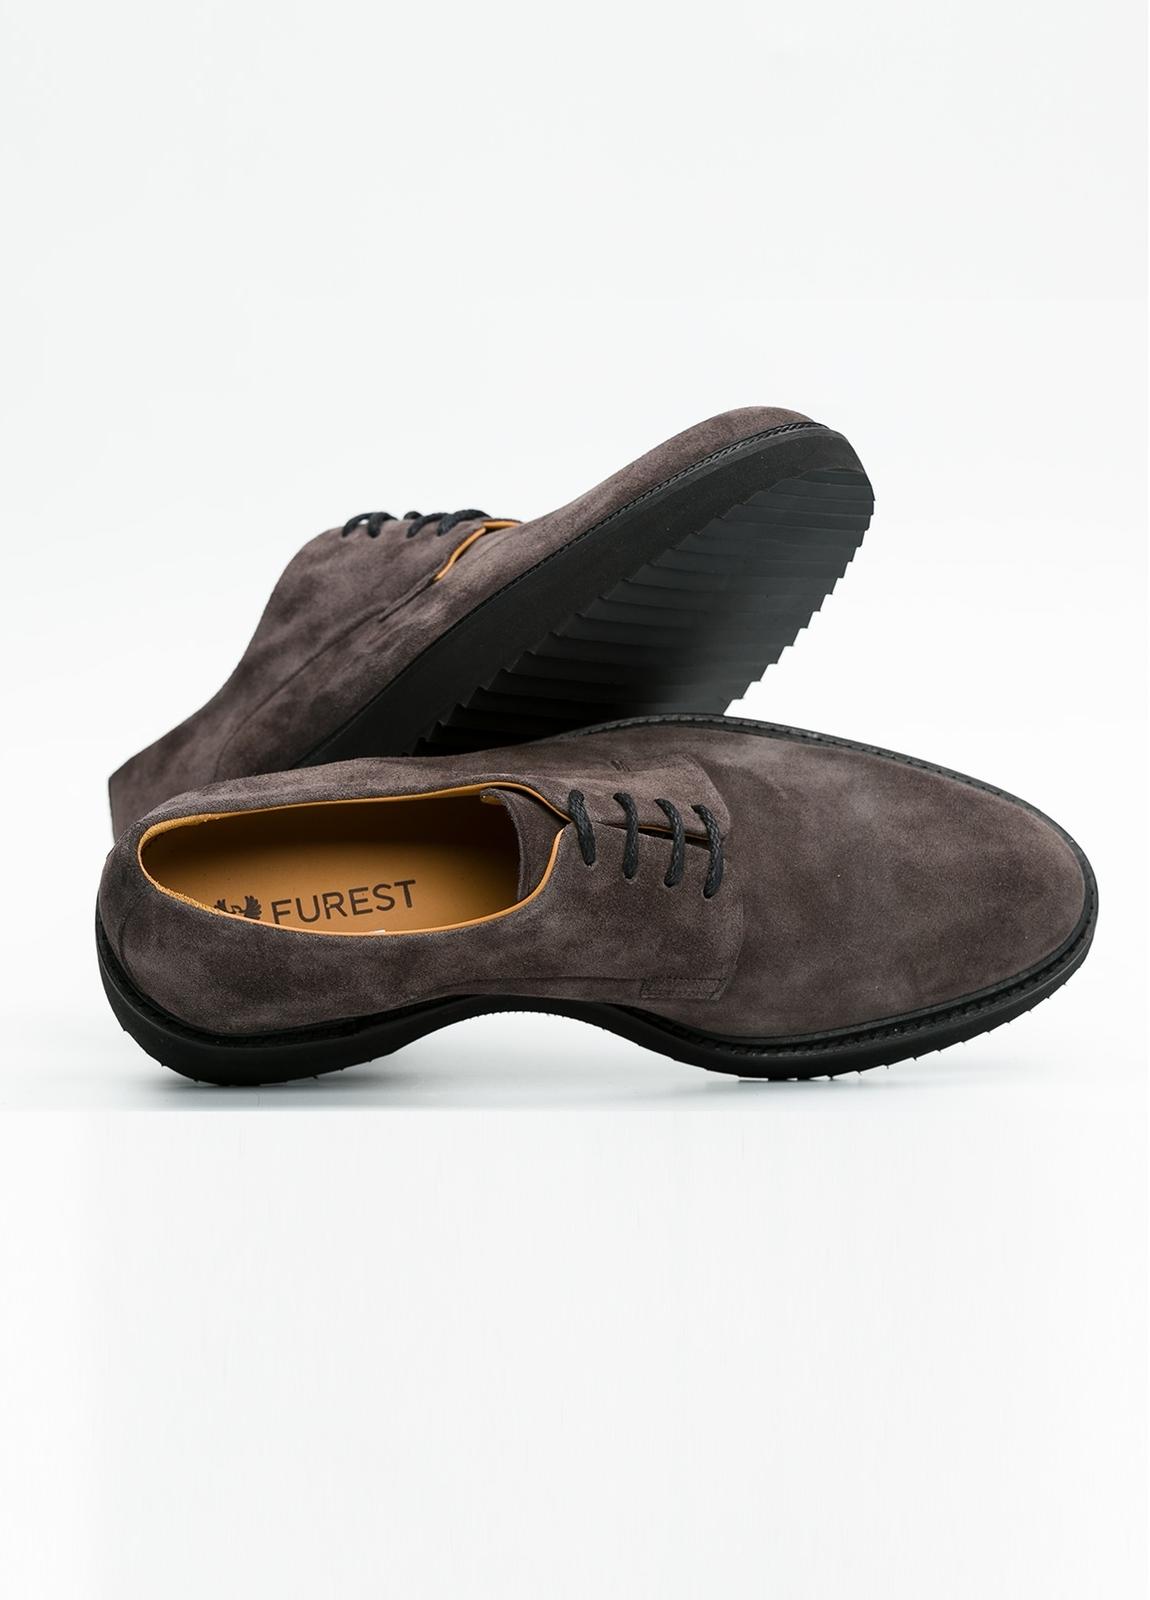 Zapato Sport Wear color gris. 100% Serraje. - Ítem4